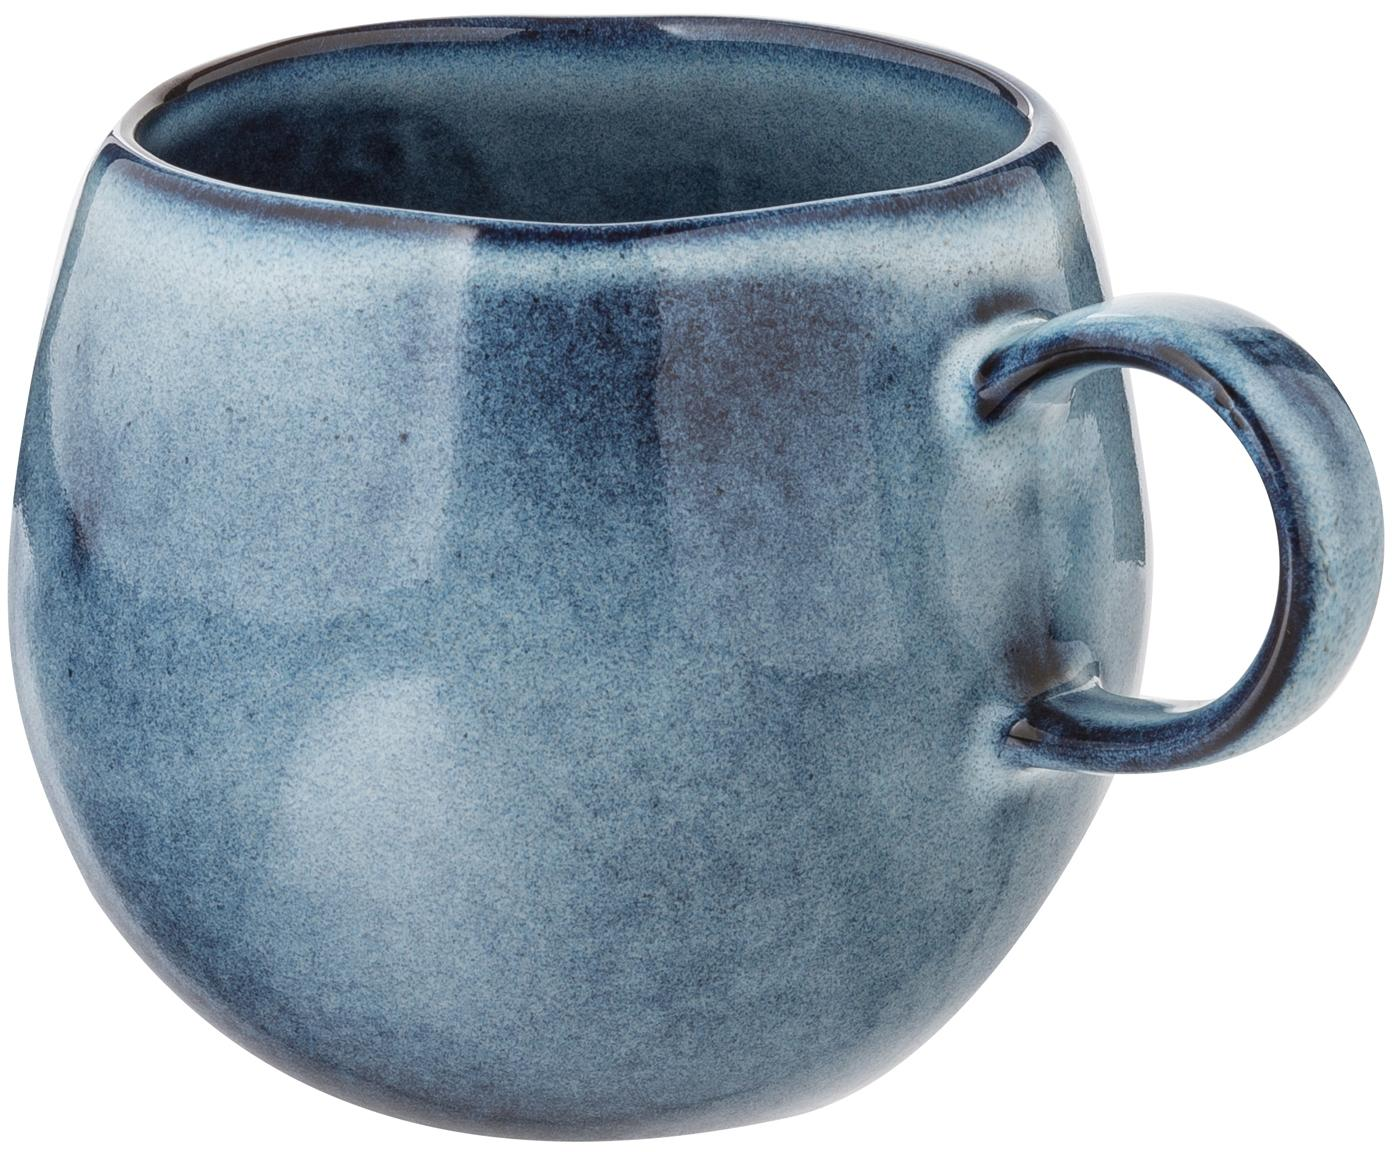 Handgemaakte mok Sandrine, Keramiek, Blauw, Ø 10 x H 10 cm